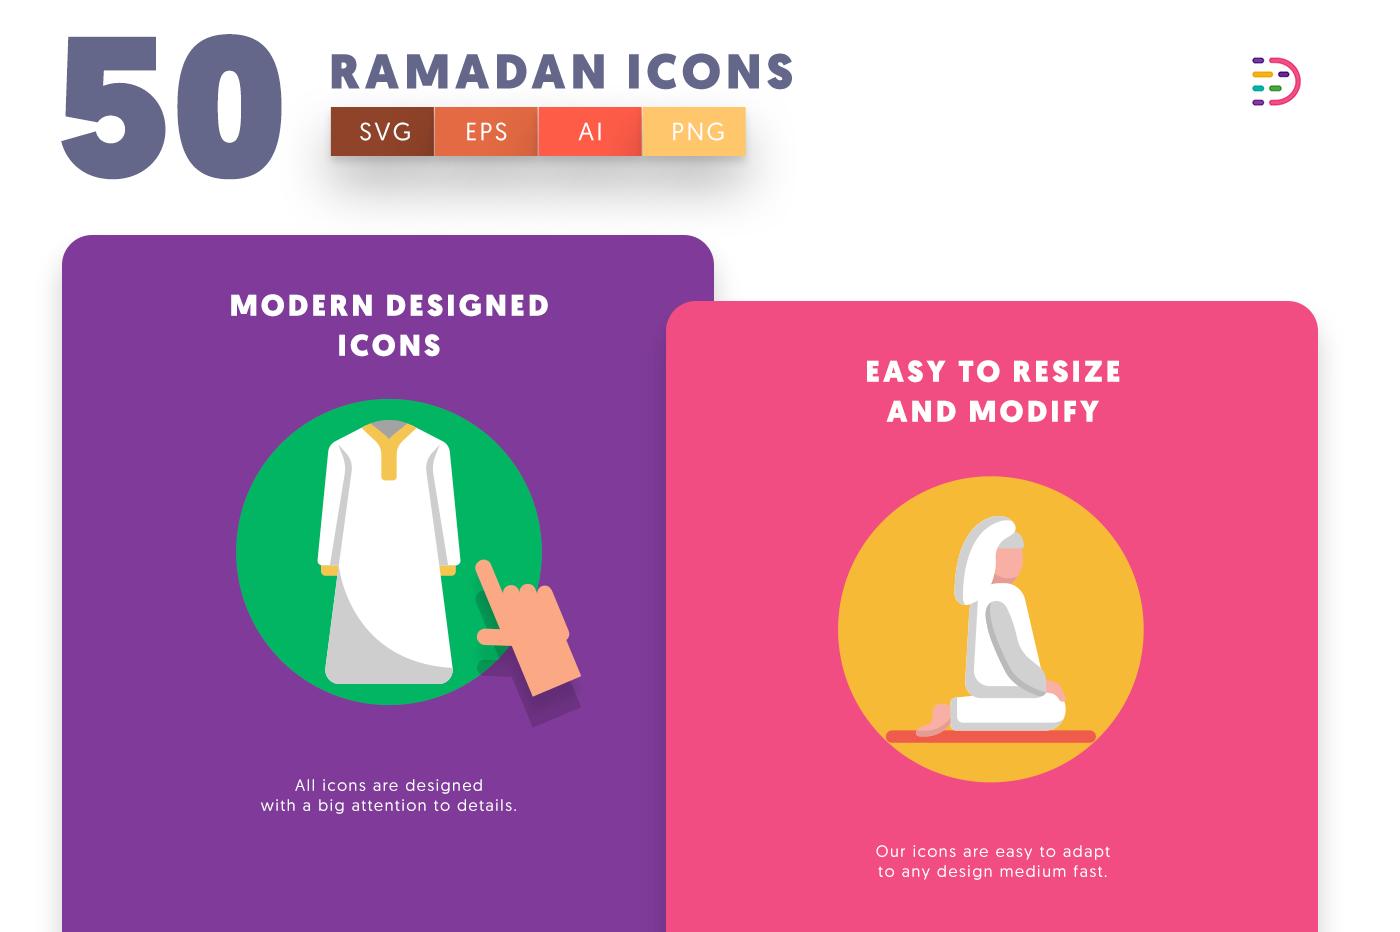 Ramadan icons png/svg/eps